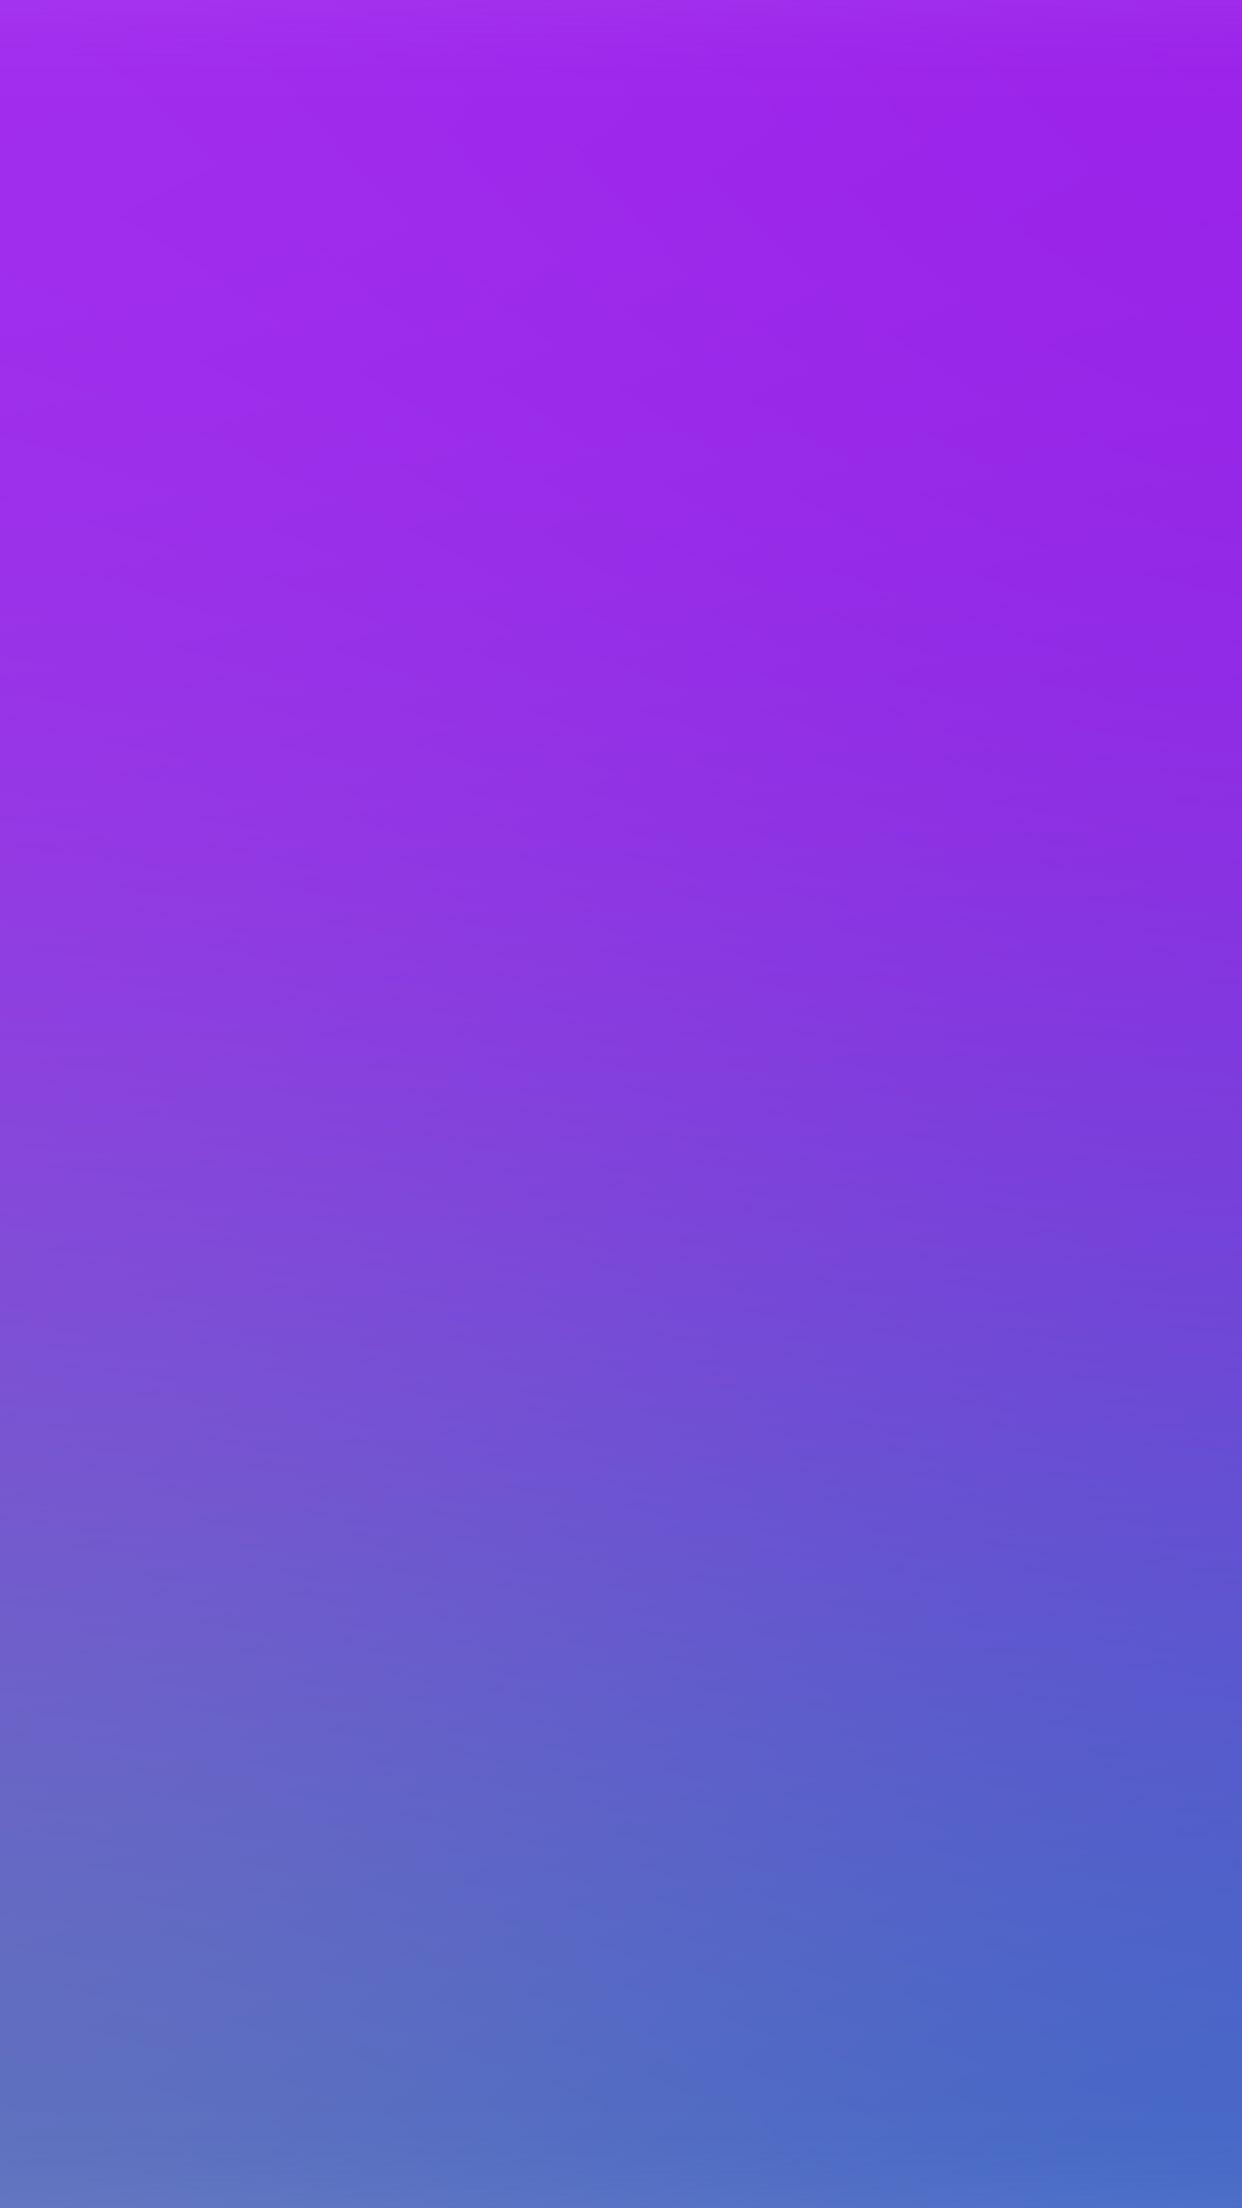 Video Game Car Wallpapers Sm09 Purple Blue Blur Gradation Wallpaper